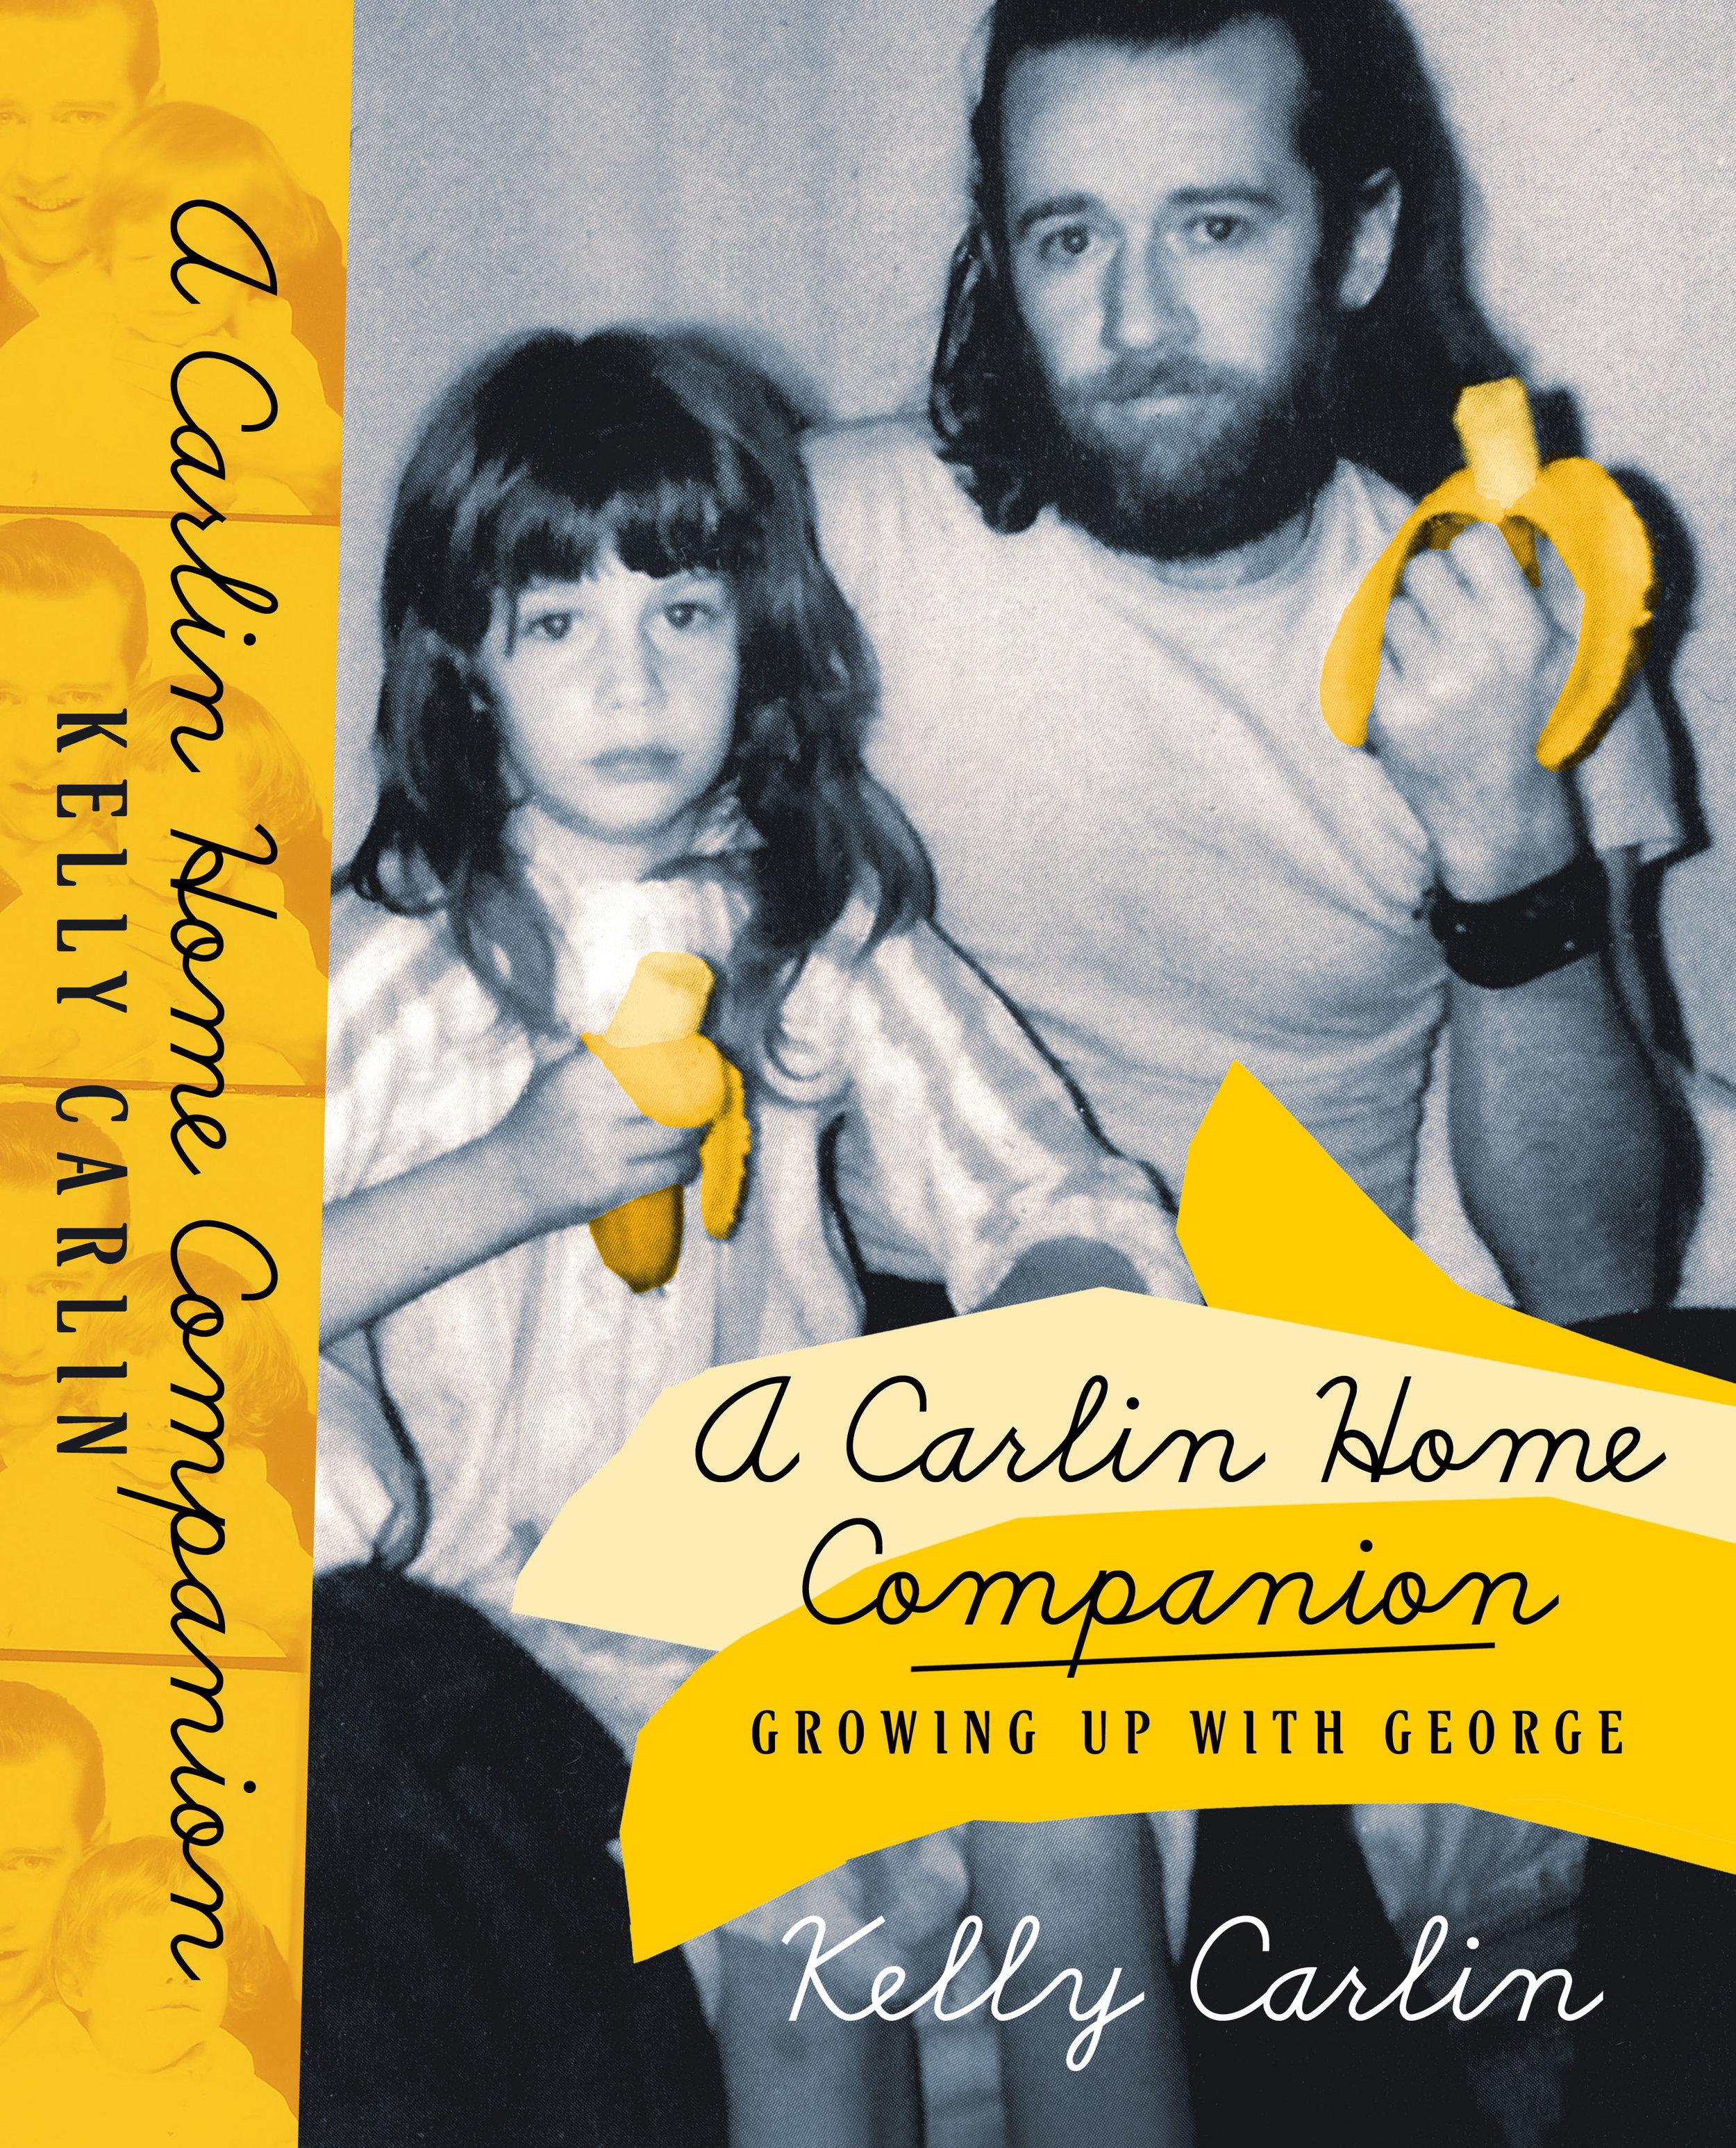 Kelly-Carlin-Home-Companion